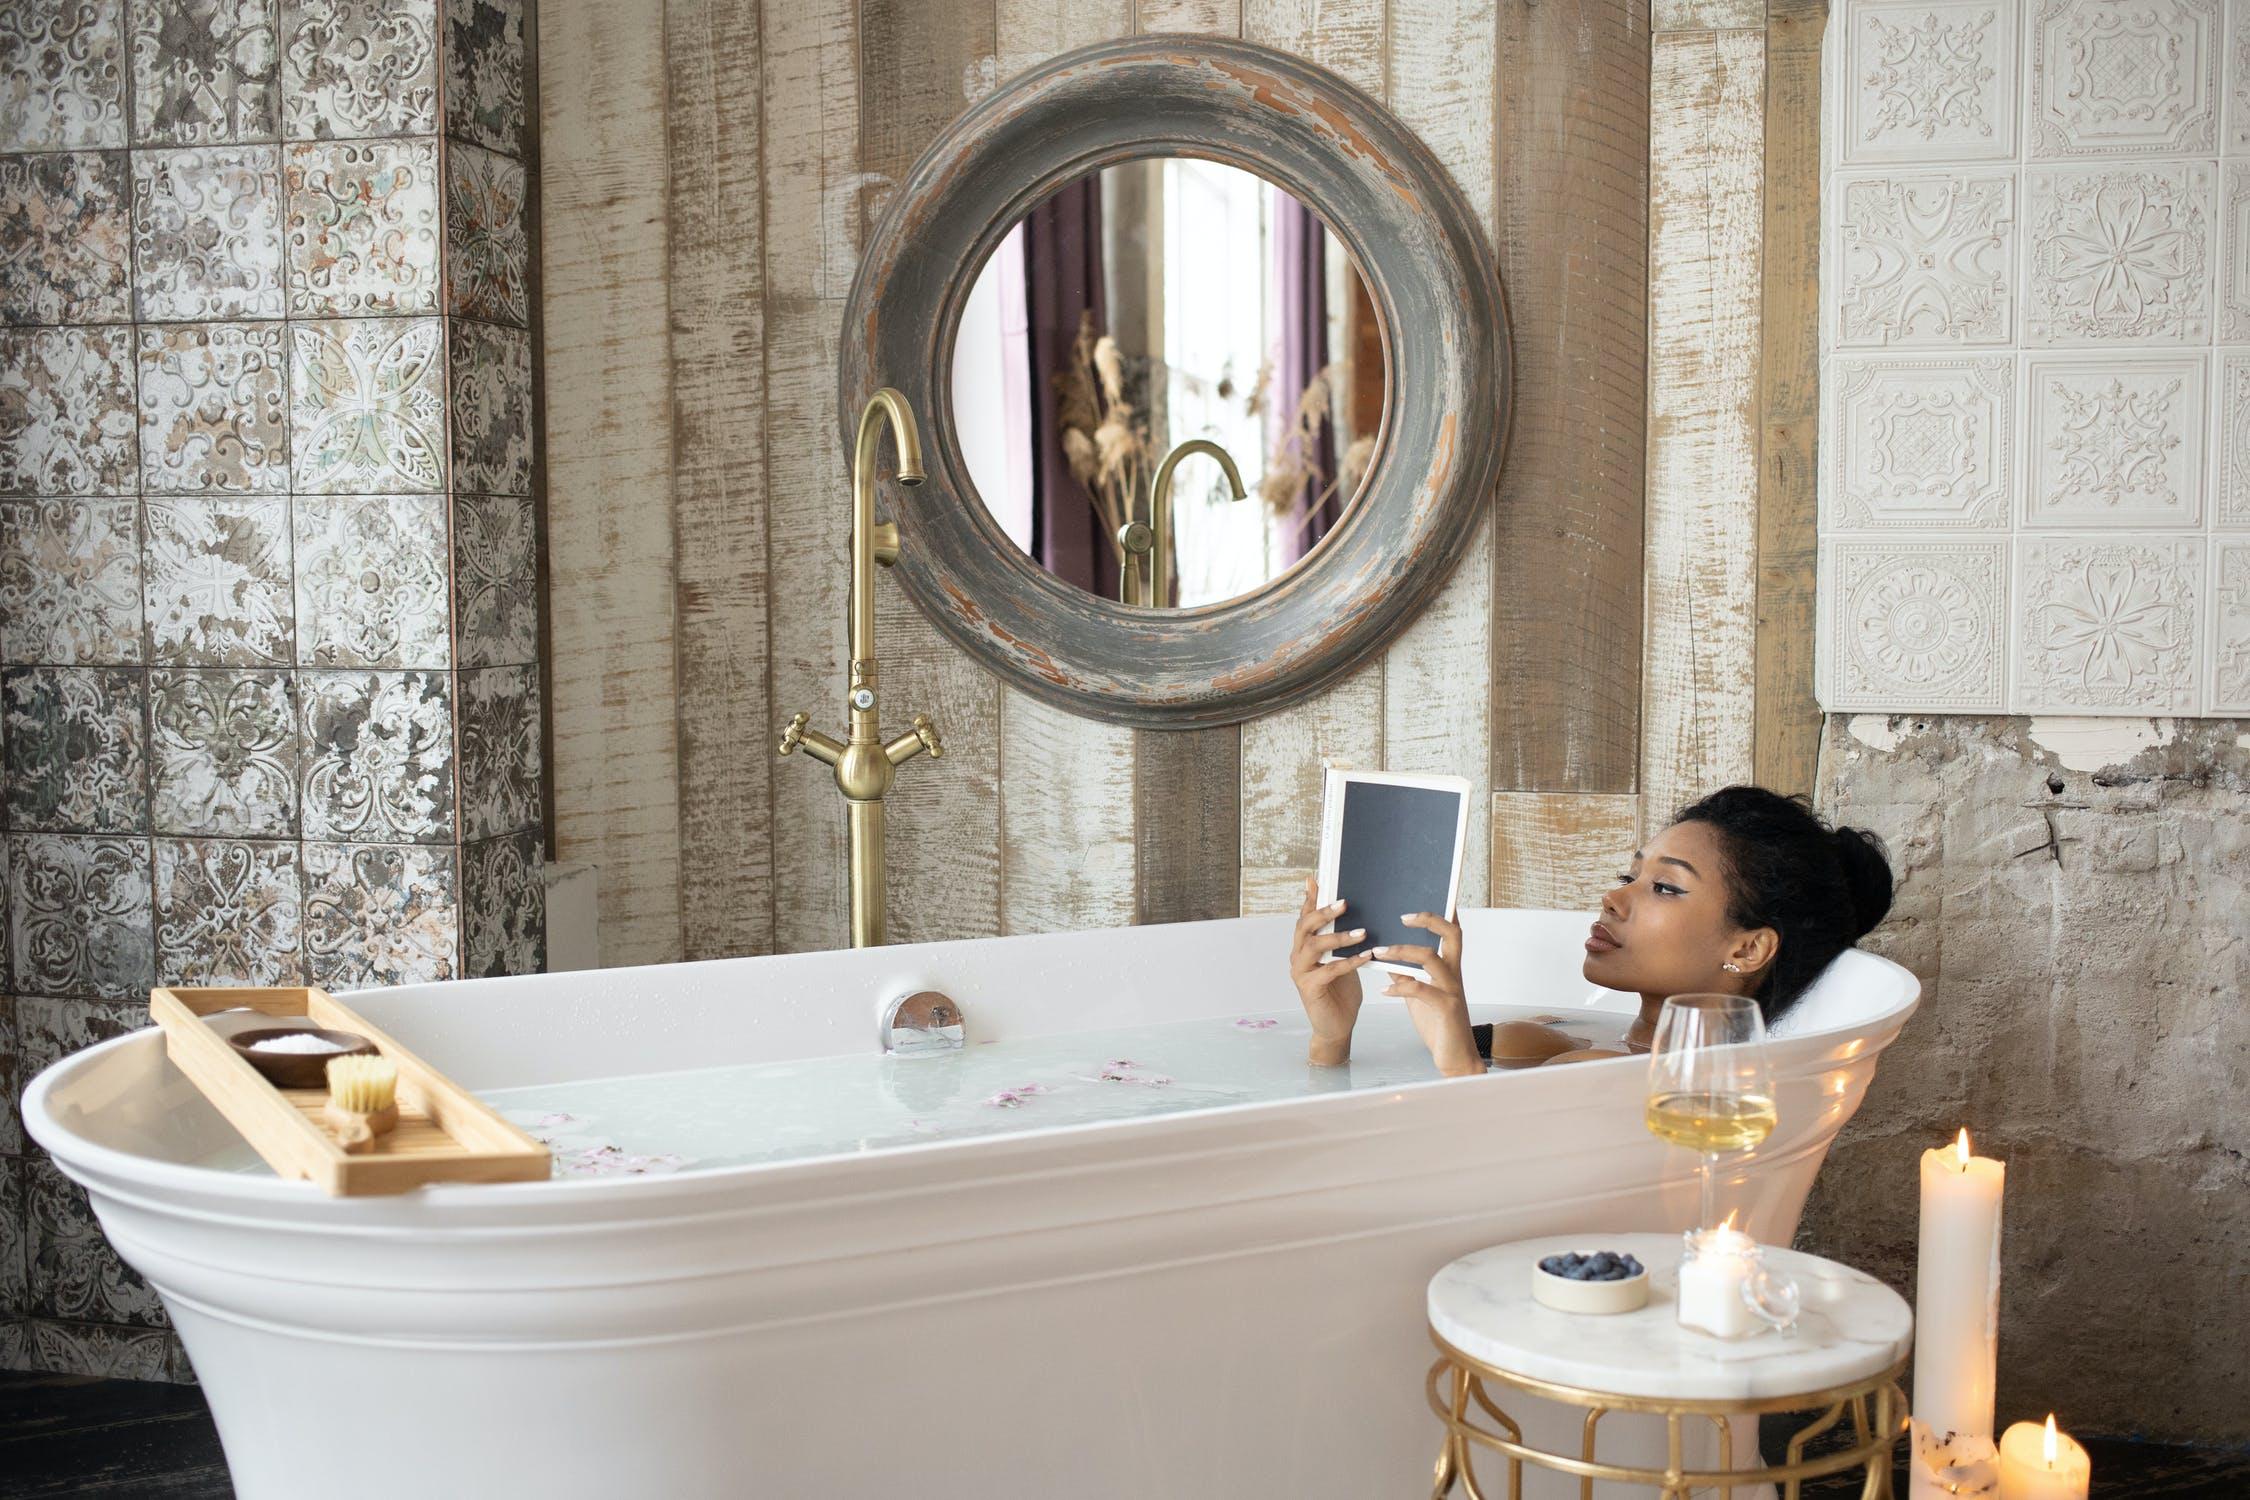 Black woman relaxing in bath tub